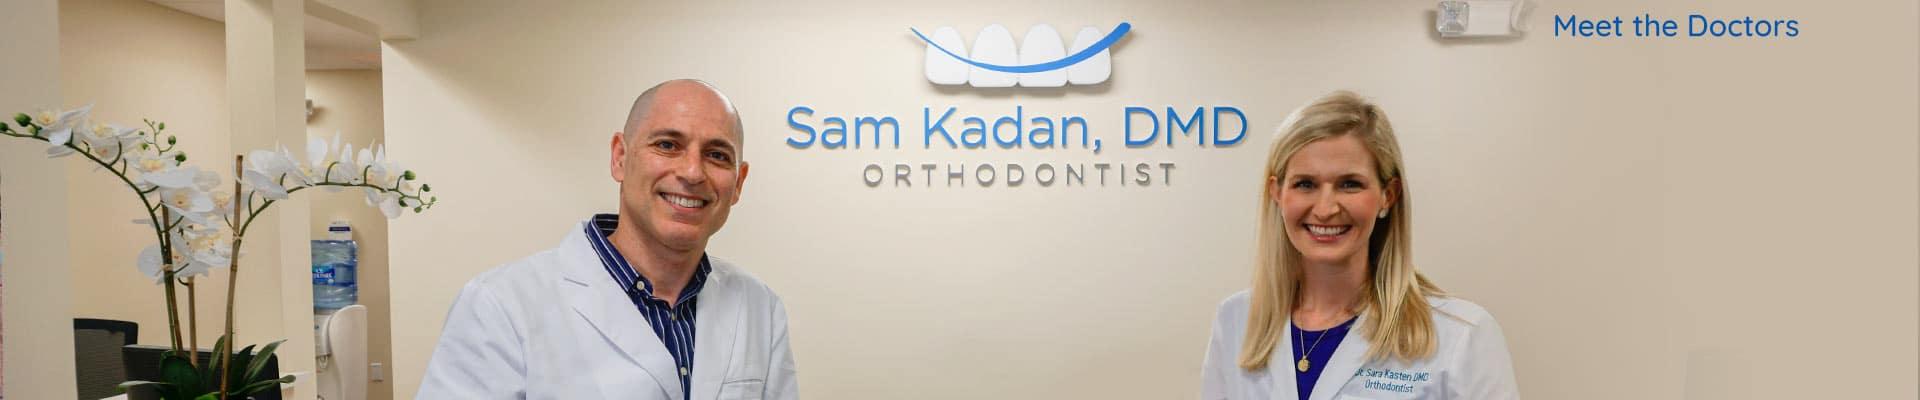 Meet the Drs at Dr. Sam Kadan